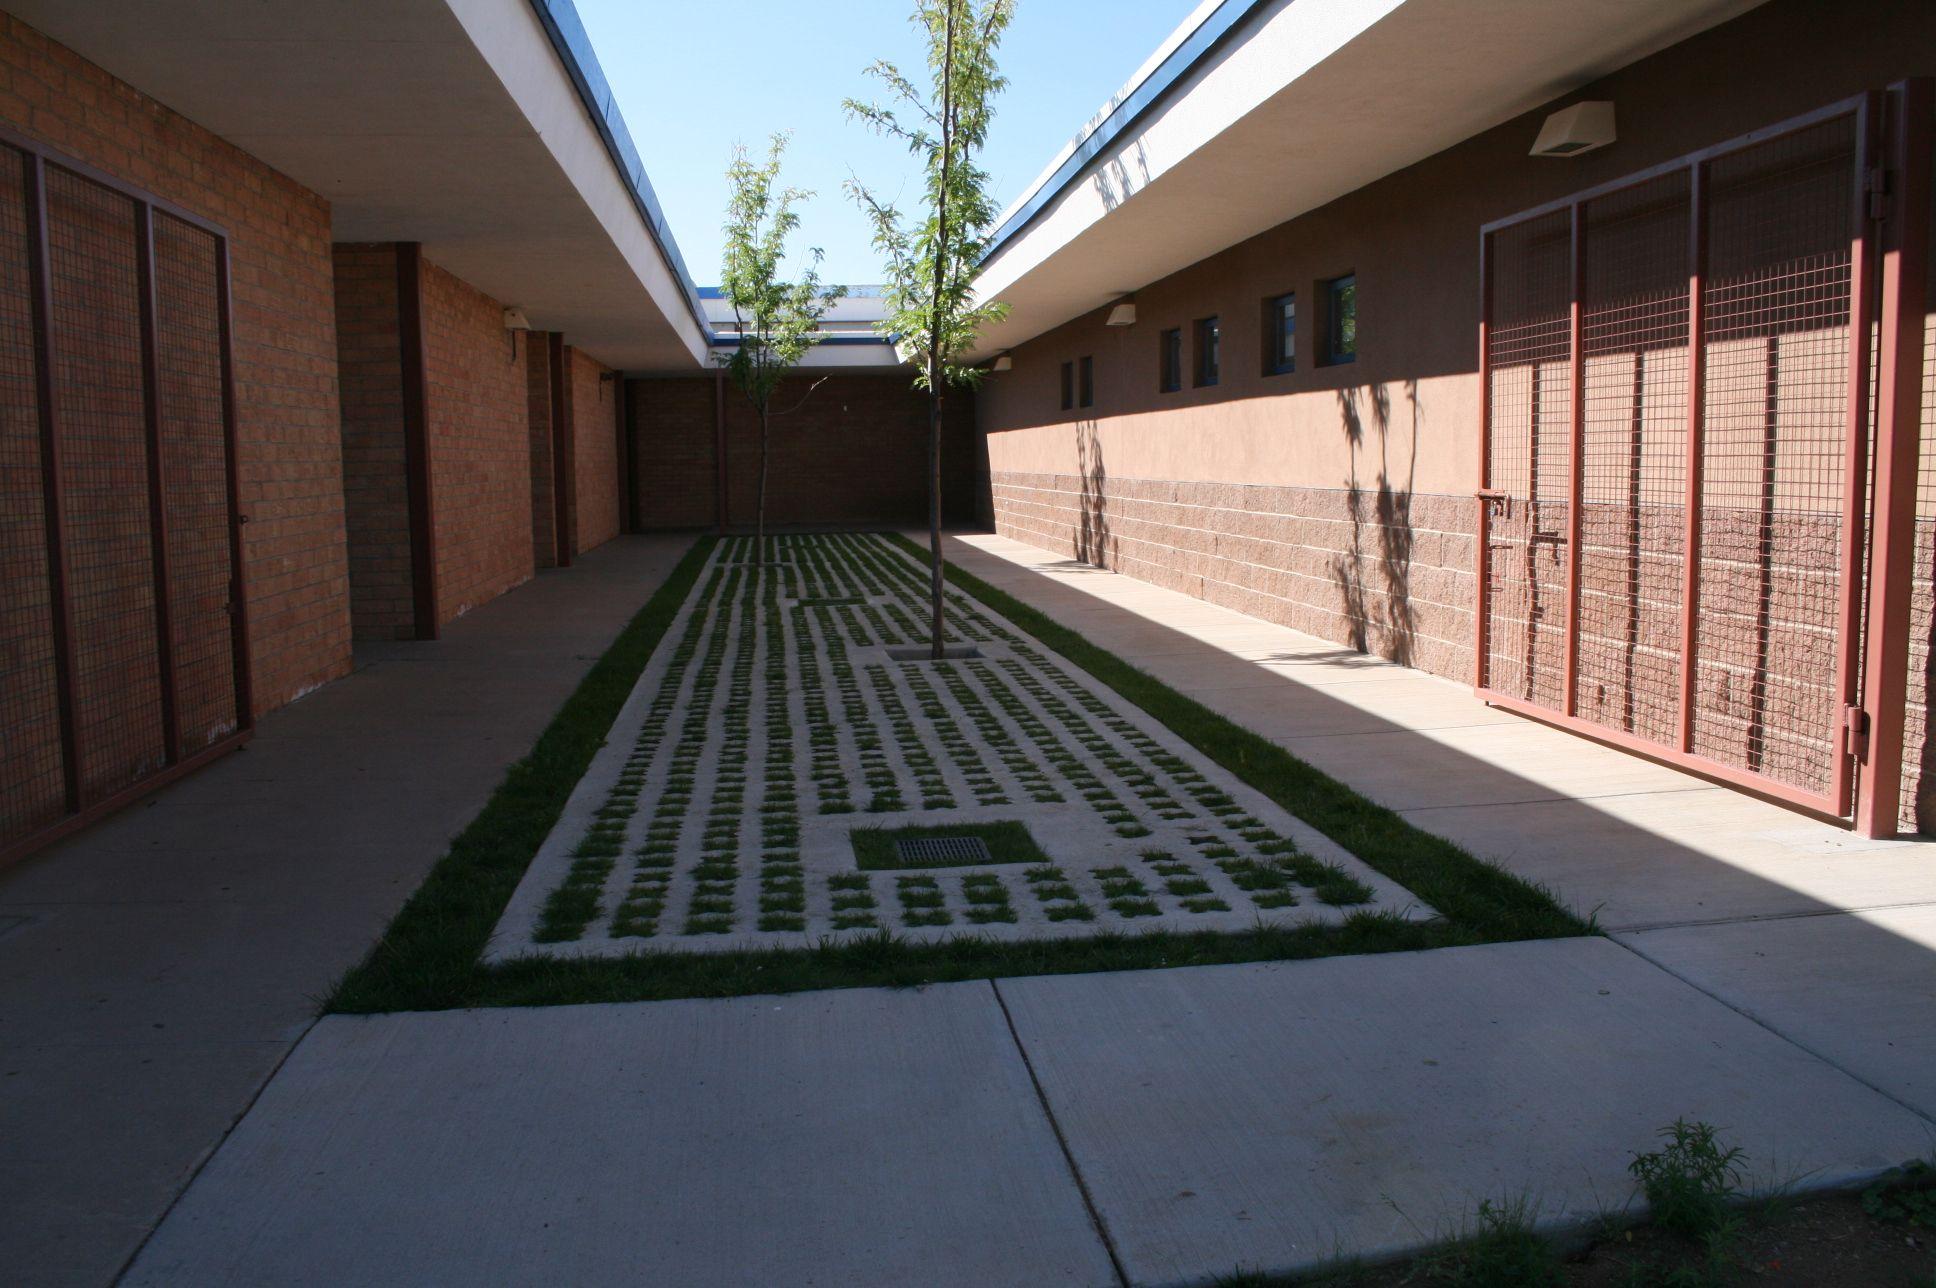 Grasscrete - St. Mikes School - 01